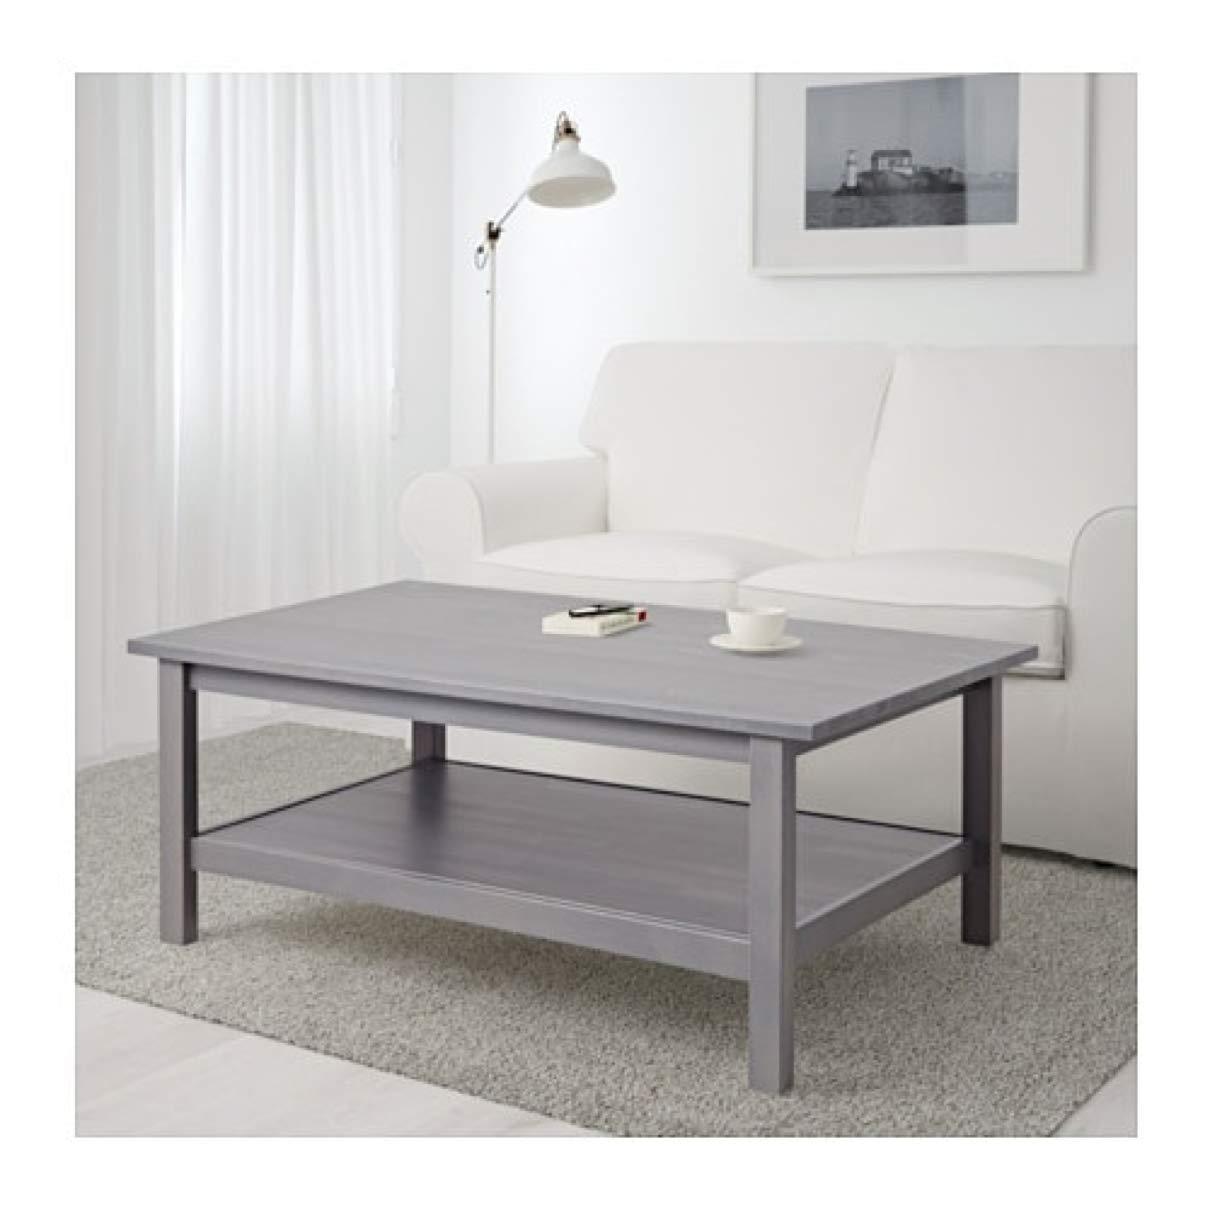 Peachy Amazon Com Ikea Hemnes Coffee Table Dark Gray Gray Stained Bralicious Painted Fabric Chair Ideas Braliciousco